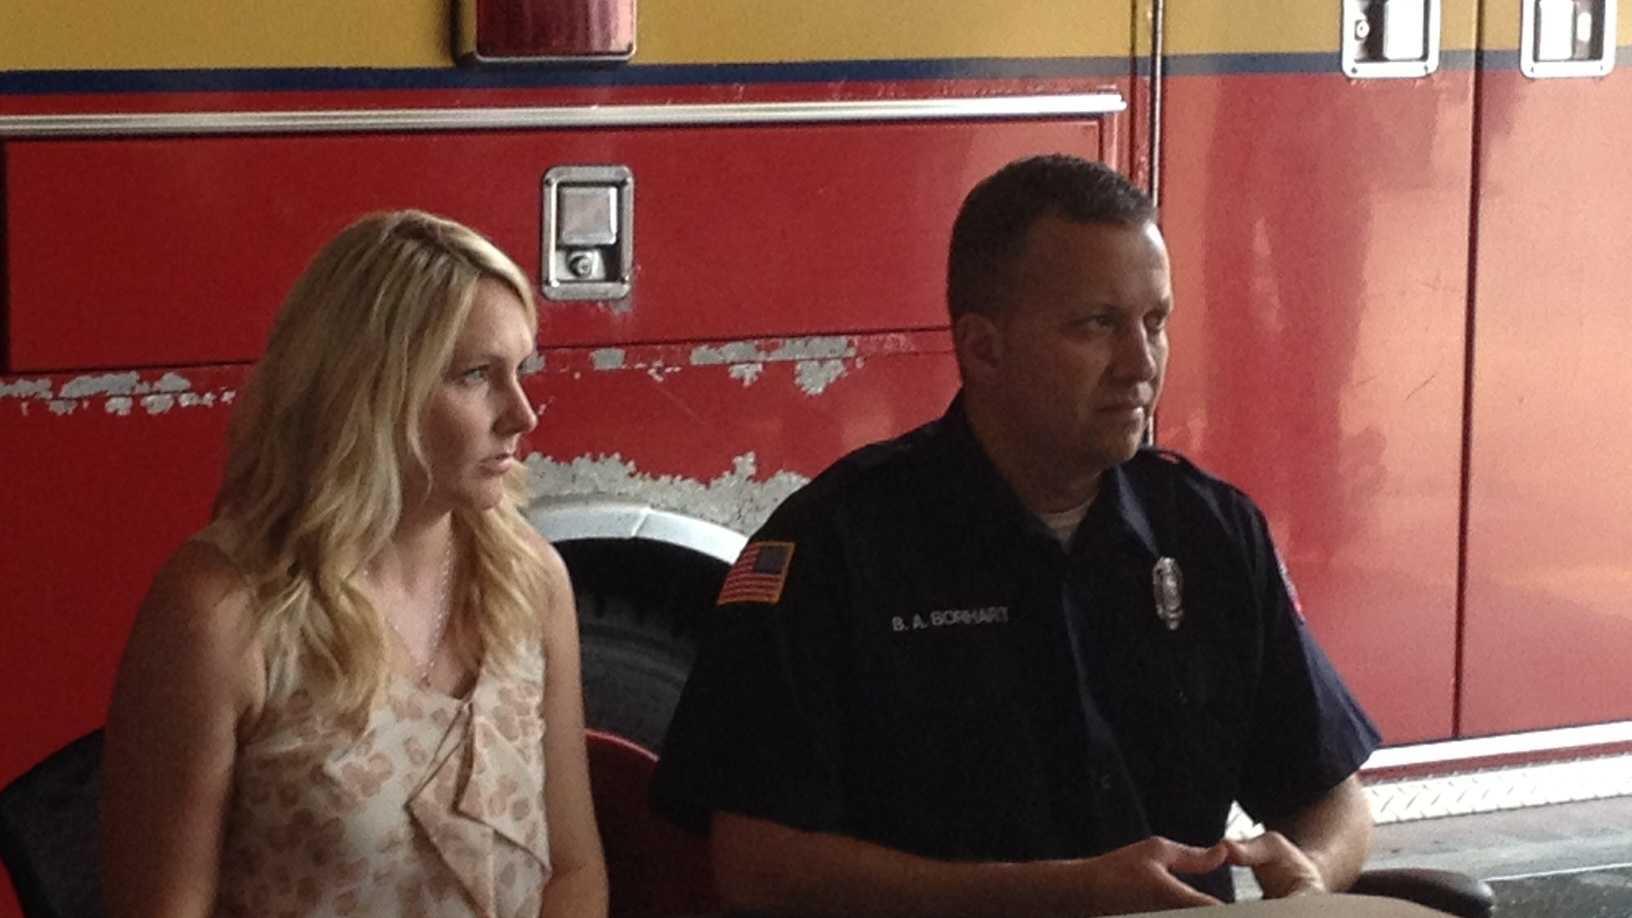 Brock Borhart and wife, firefighter.jpg